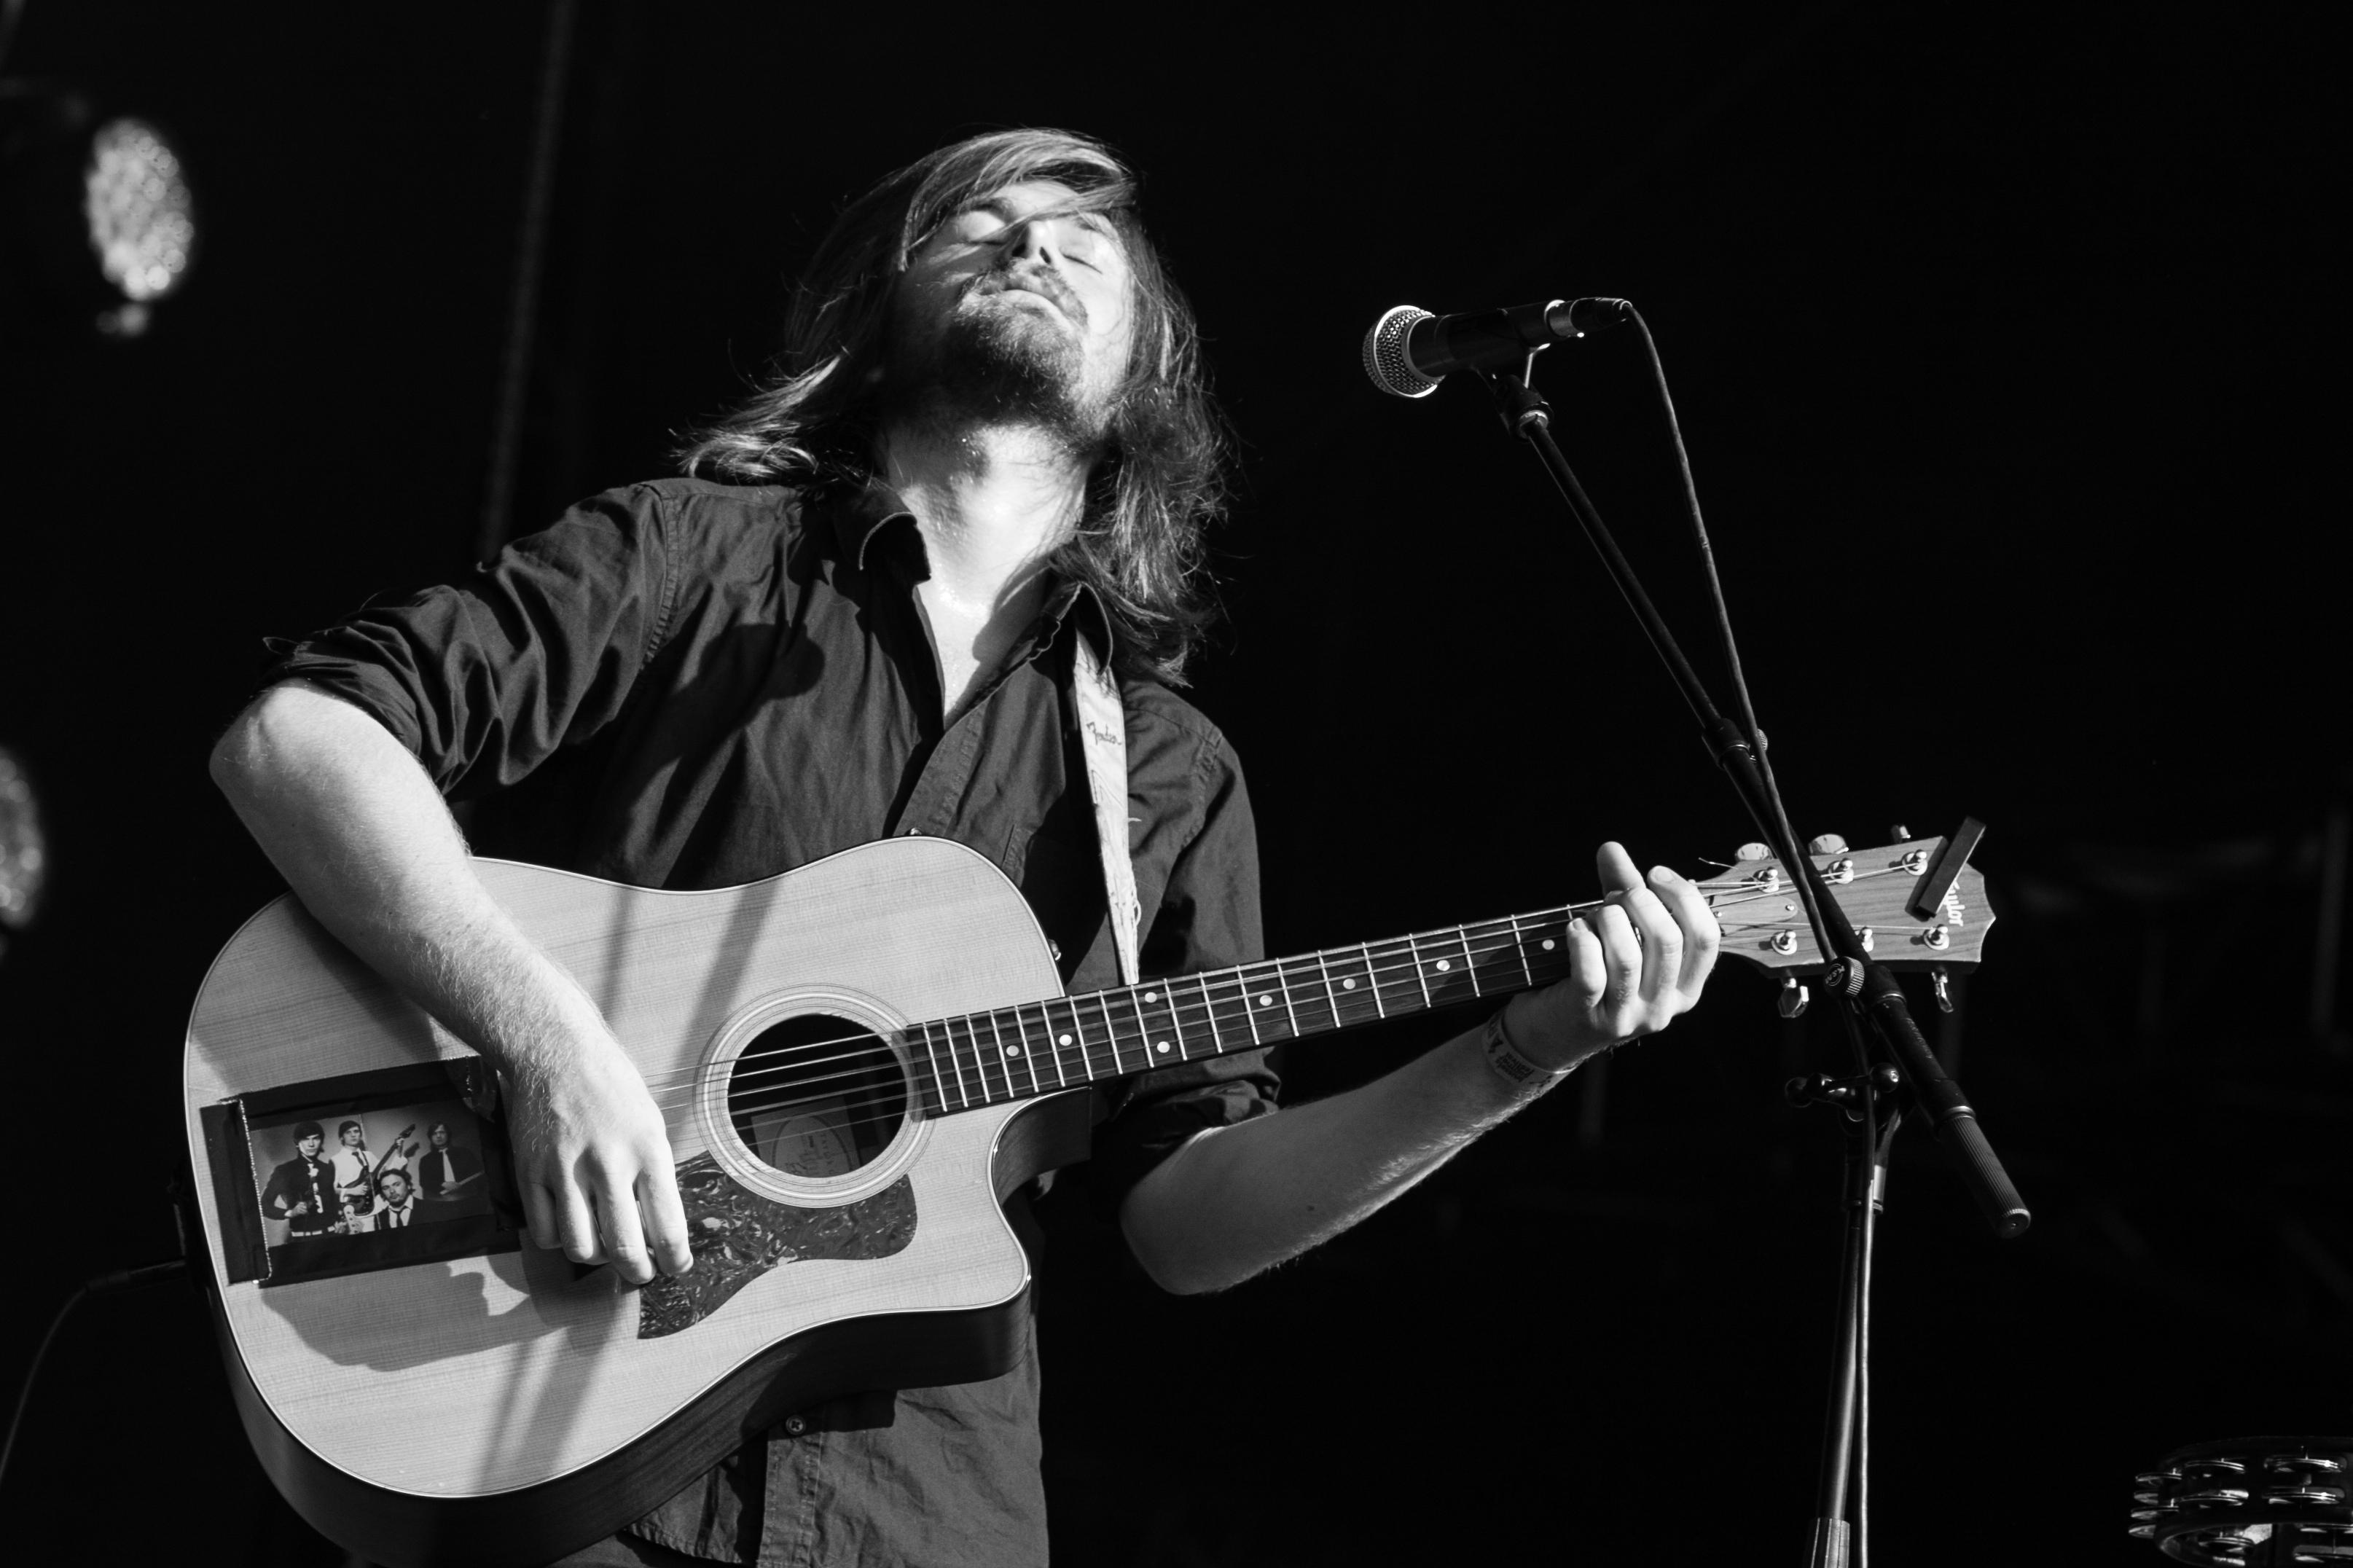 Dan San @ Brussels Summer Festival 2012, 2012, Guitar, Stringed instrument, San, HQ Photo